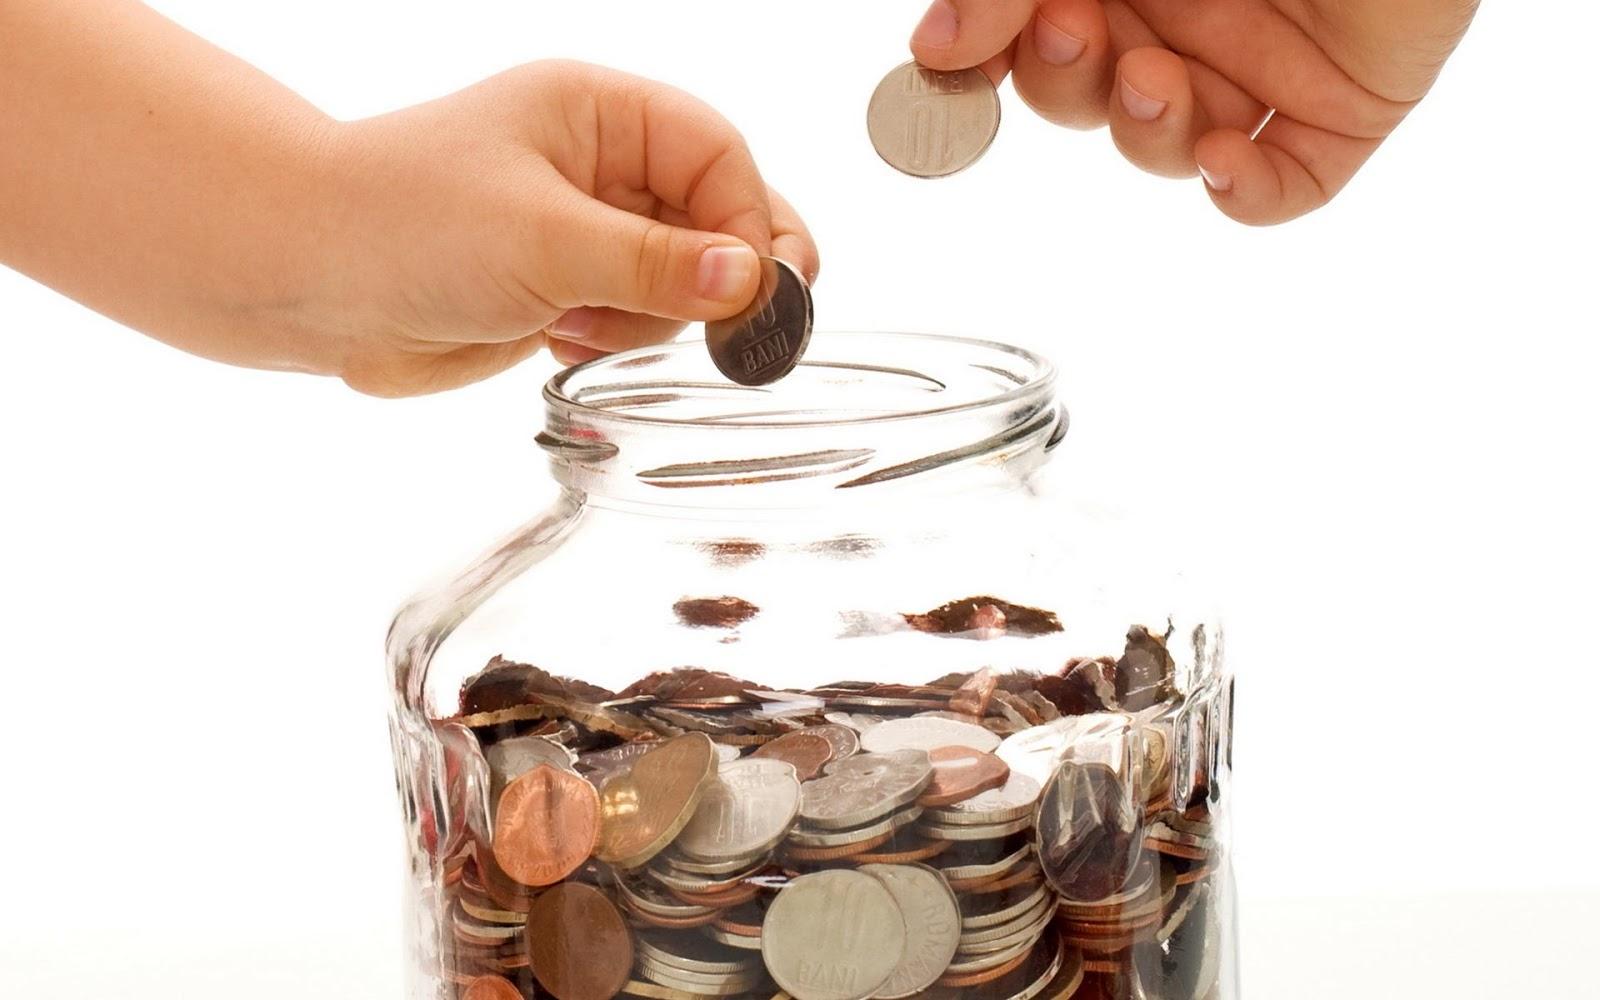 7 Tips Liburan Hemat Ala Anak Kost, tips makan hemat ala anak kost, cara menabung ala anak kost, tabel pengeluaran anak kost, contoh daftar belanja bulanan anak kos